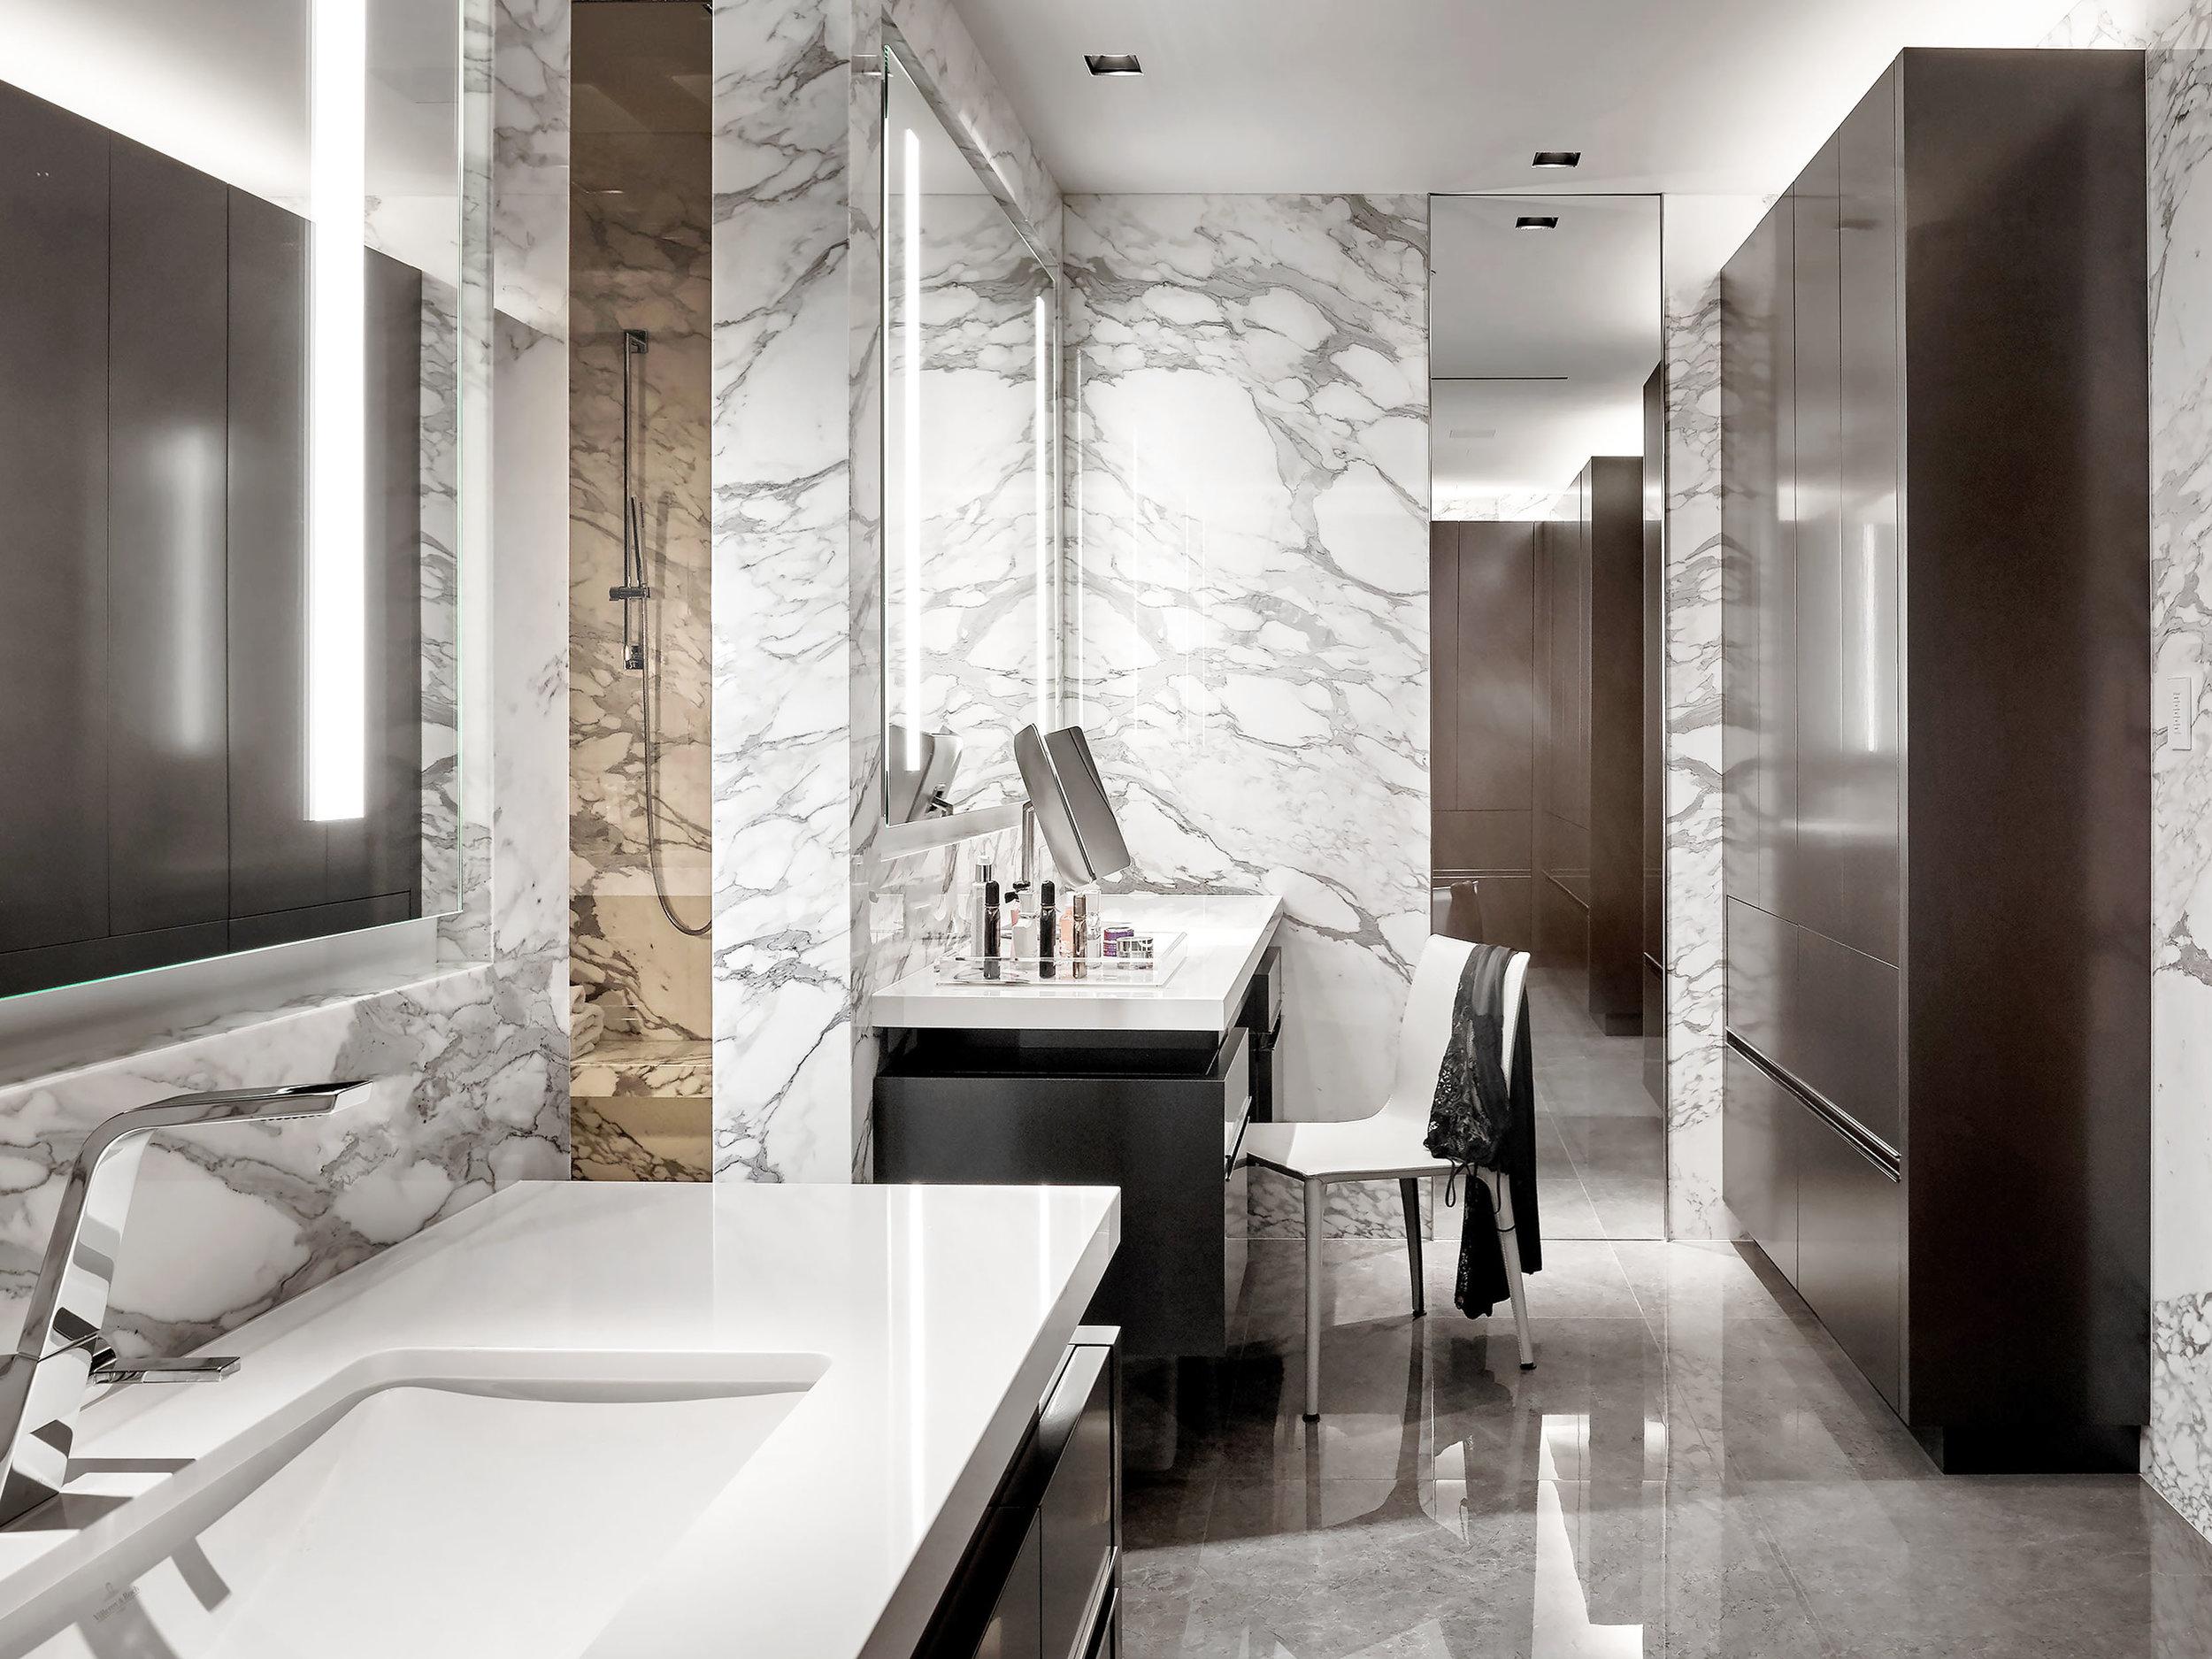 DeSat_Fort-Lauderdale-Bathroom-Design-B-and-G-Design.jpg